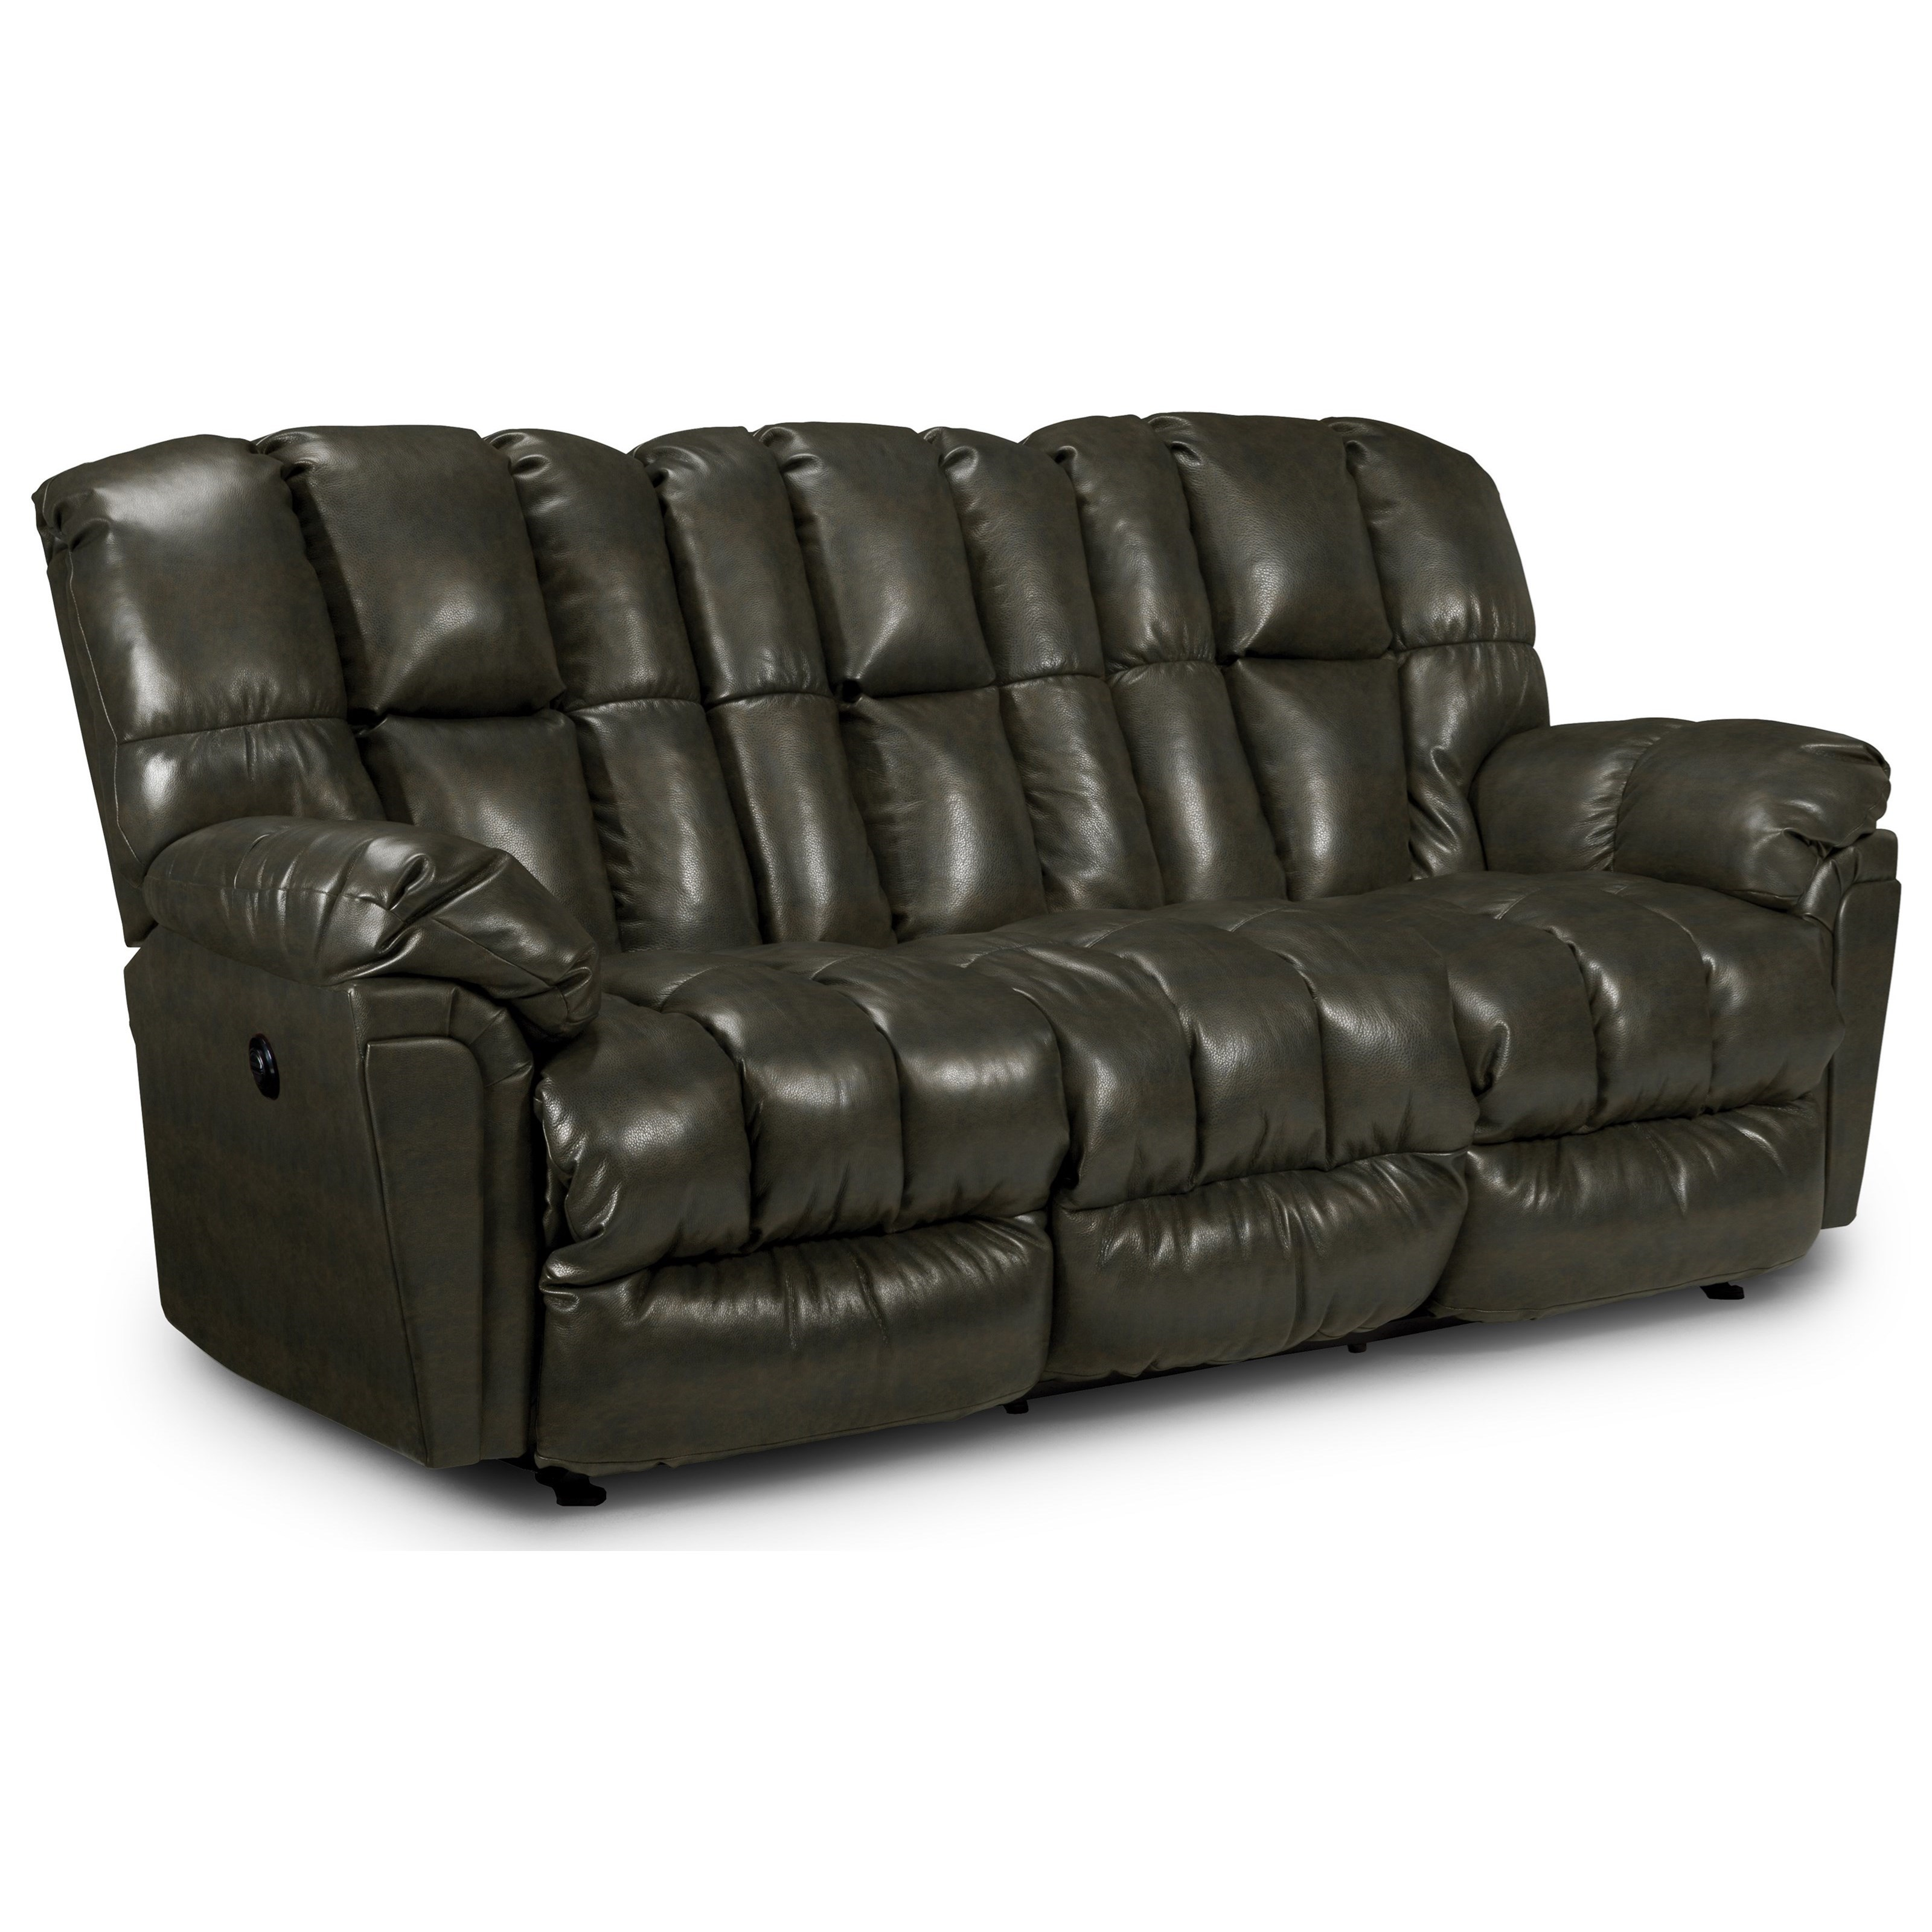 Best Home Furnishings Lucas Power Reclining Sofa - Item Number: -2014665783-24783U